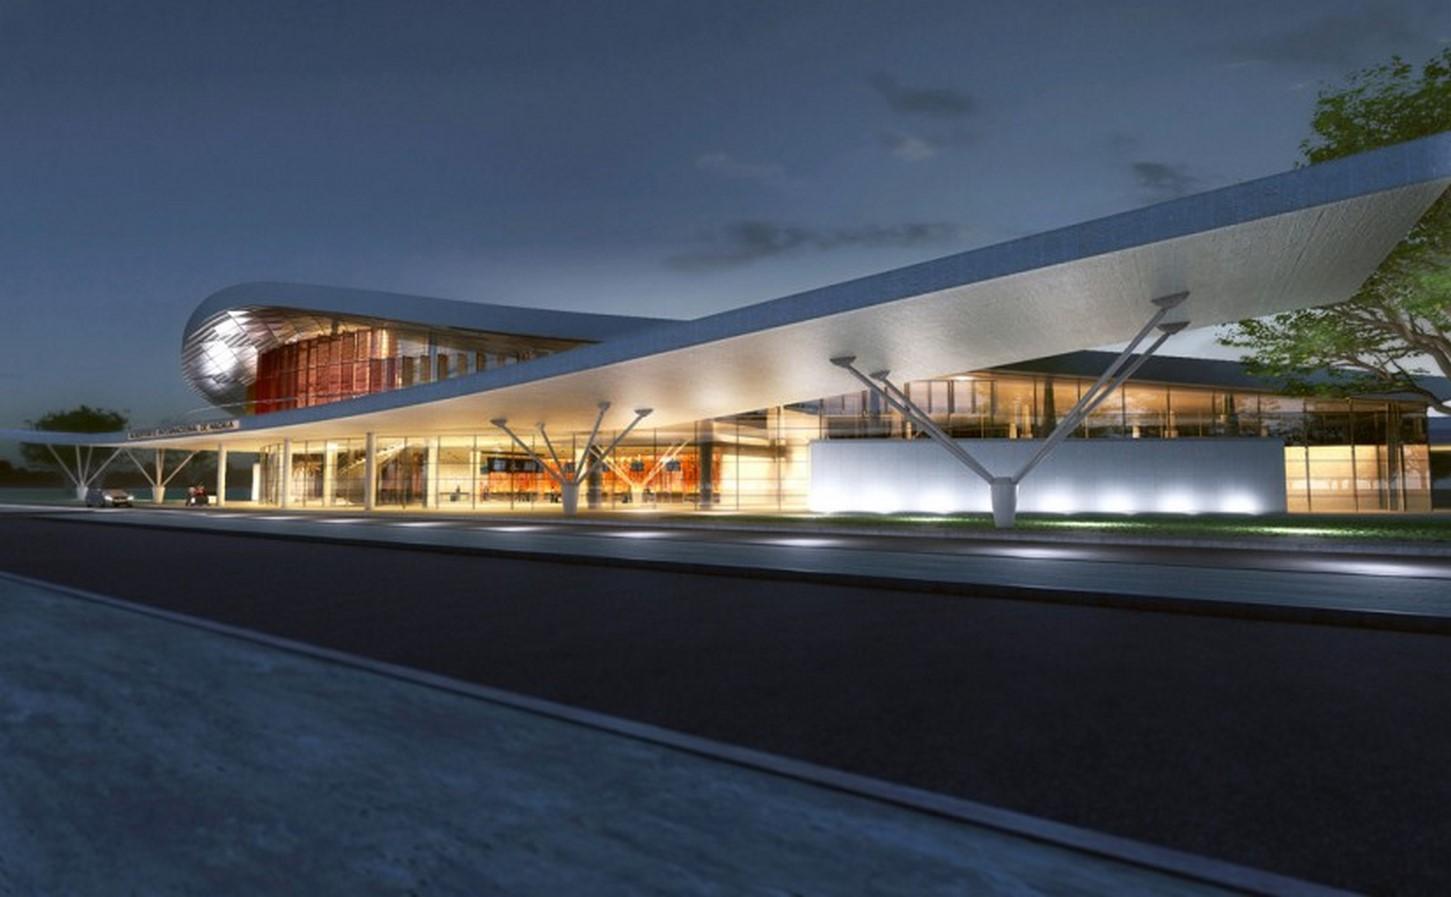 Nacala Airport / Fernandes Arquitetos Associados - Sheet1